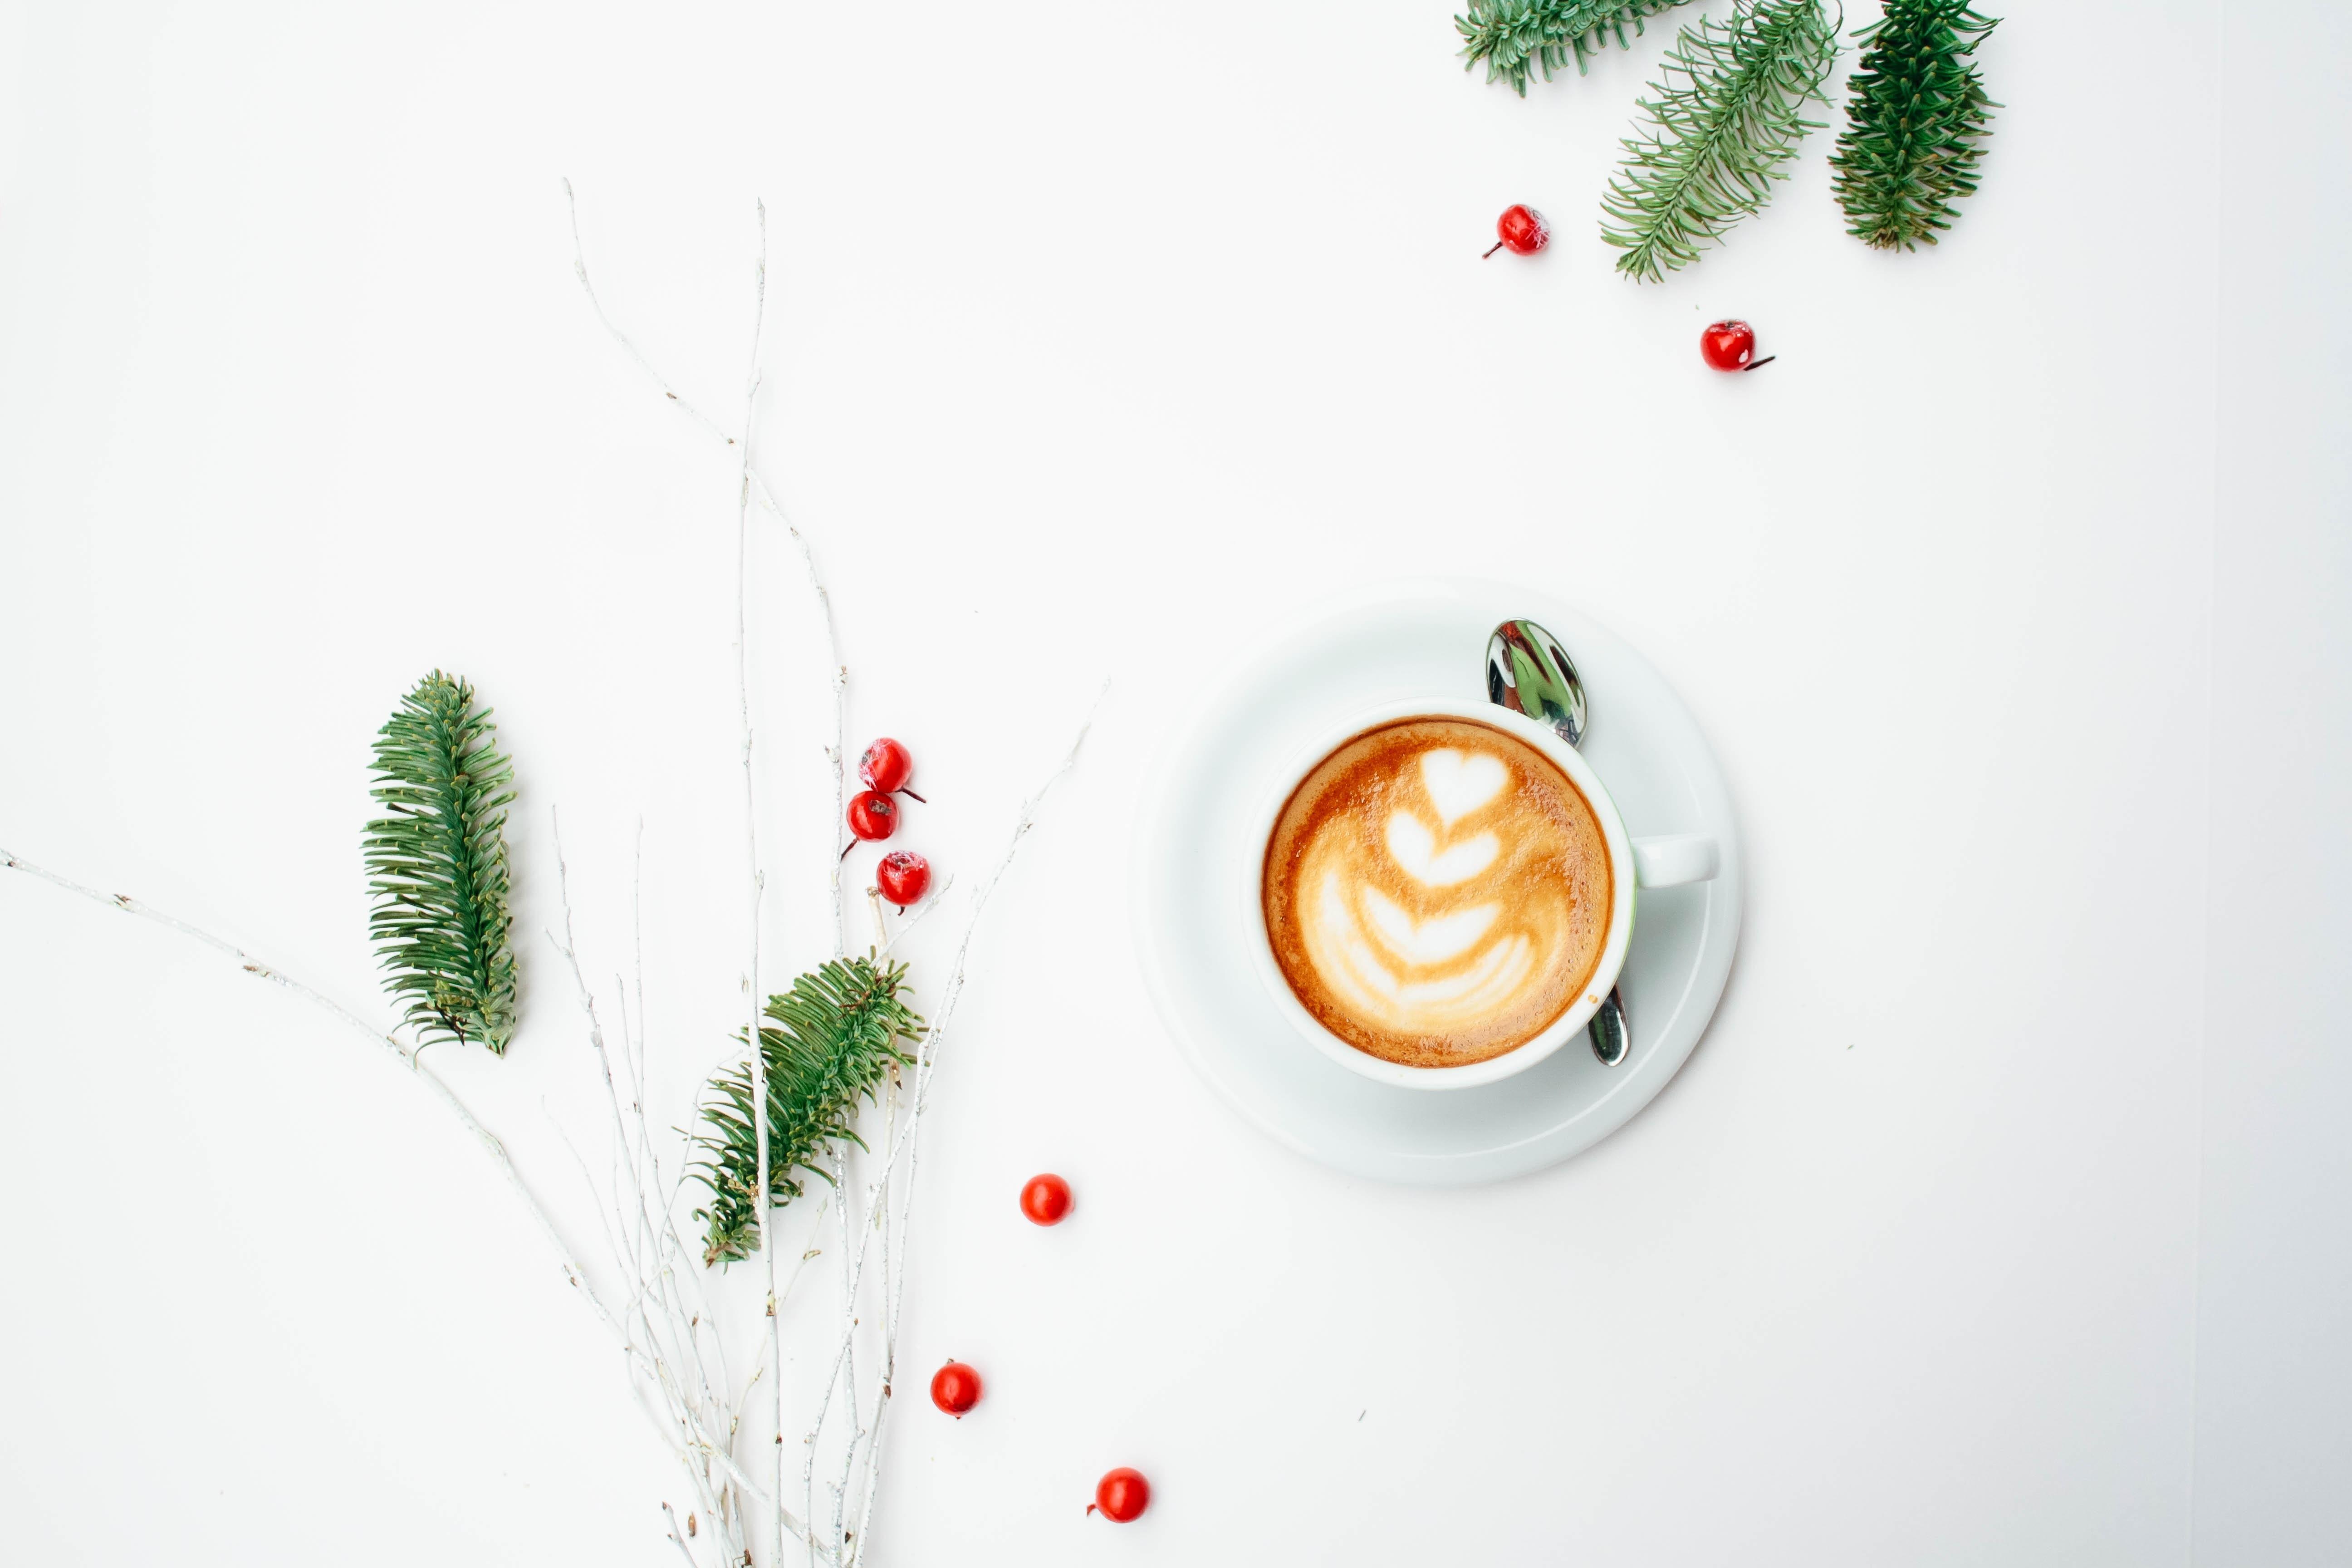 Kostenlose foto : Kaffee, Pflanze, Frucht, Beere, Blatt ...